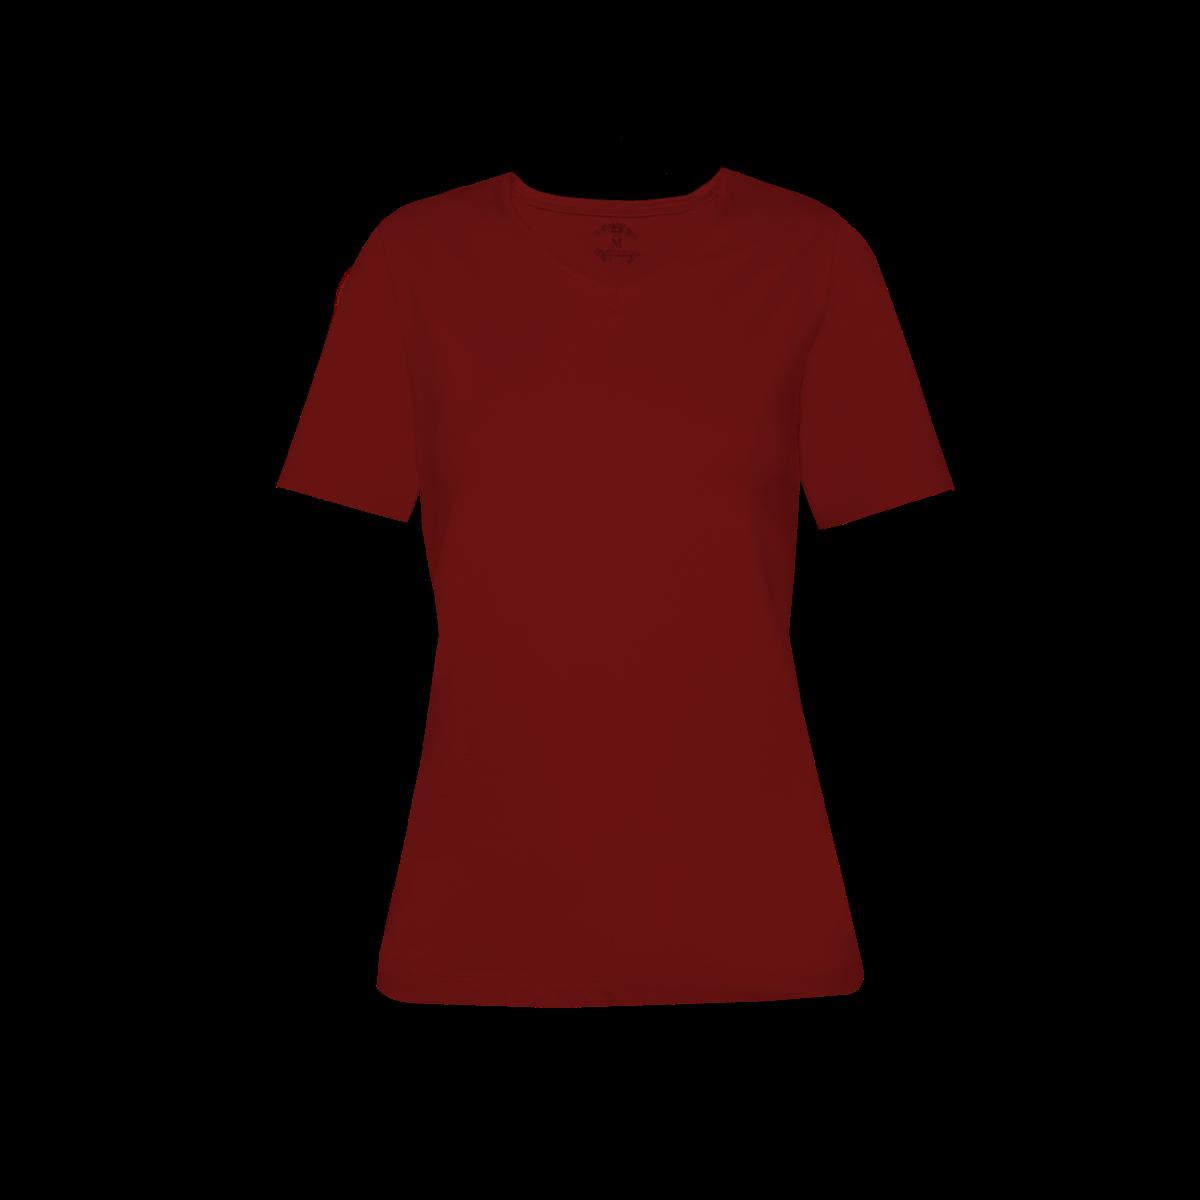 Ženska majica, rdeča